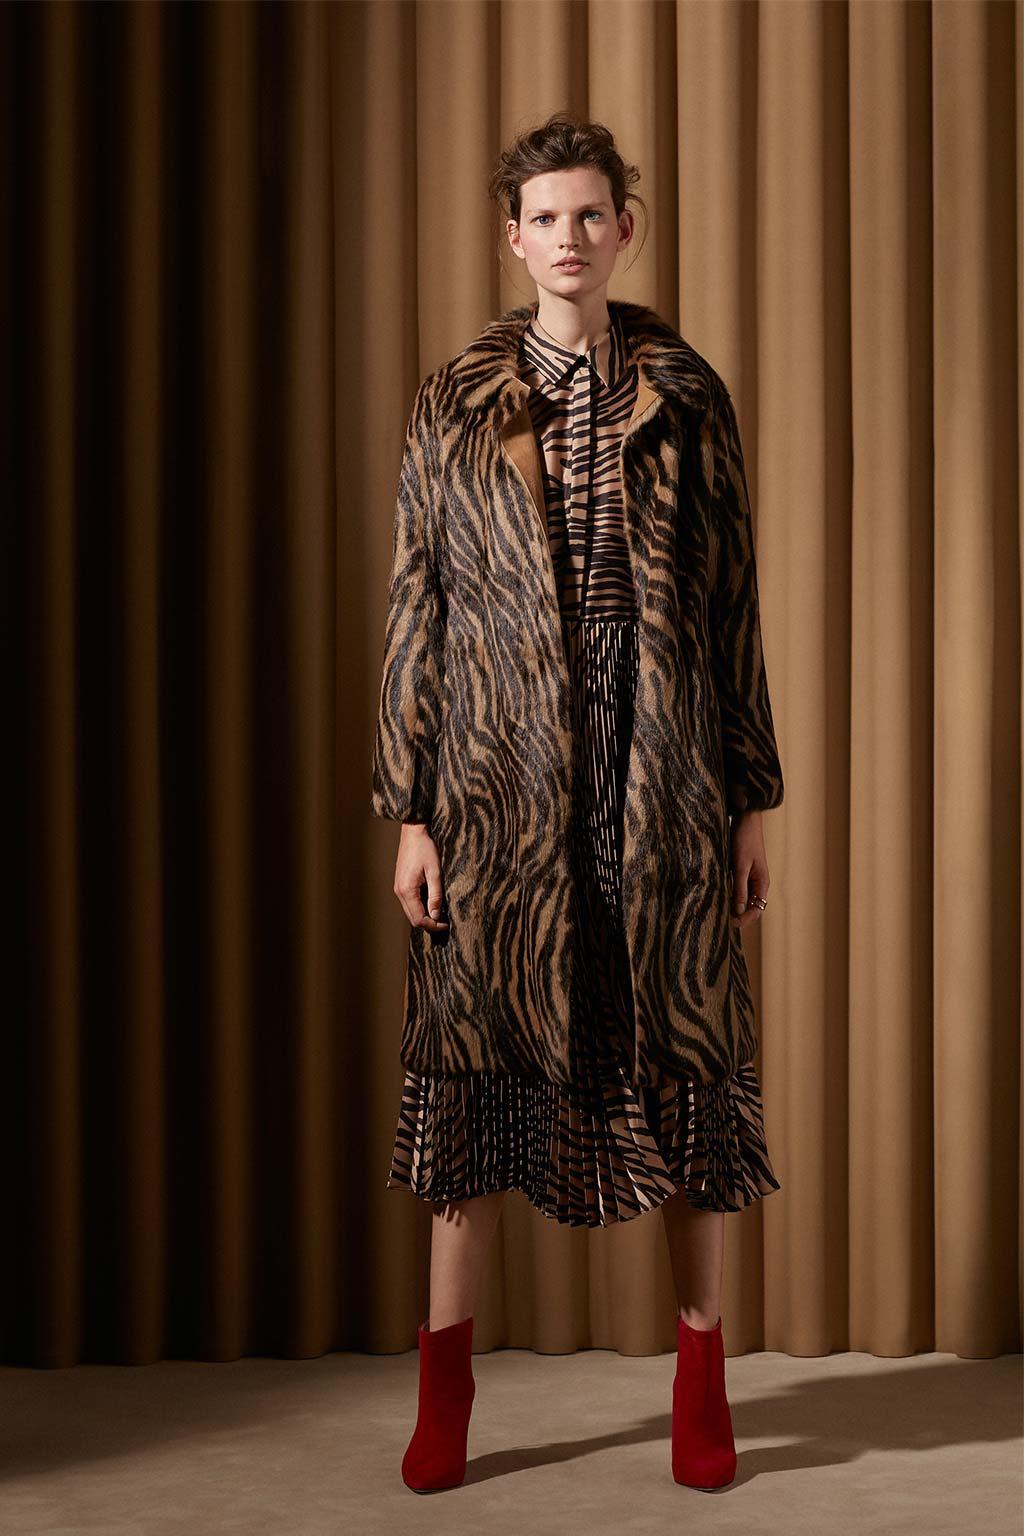 CH Carolina Herrera. New womenswear collection Spotlight. Look 15